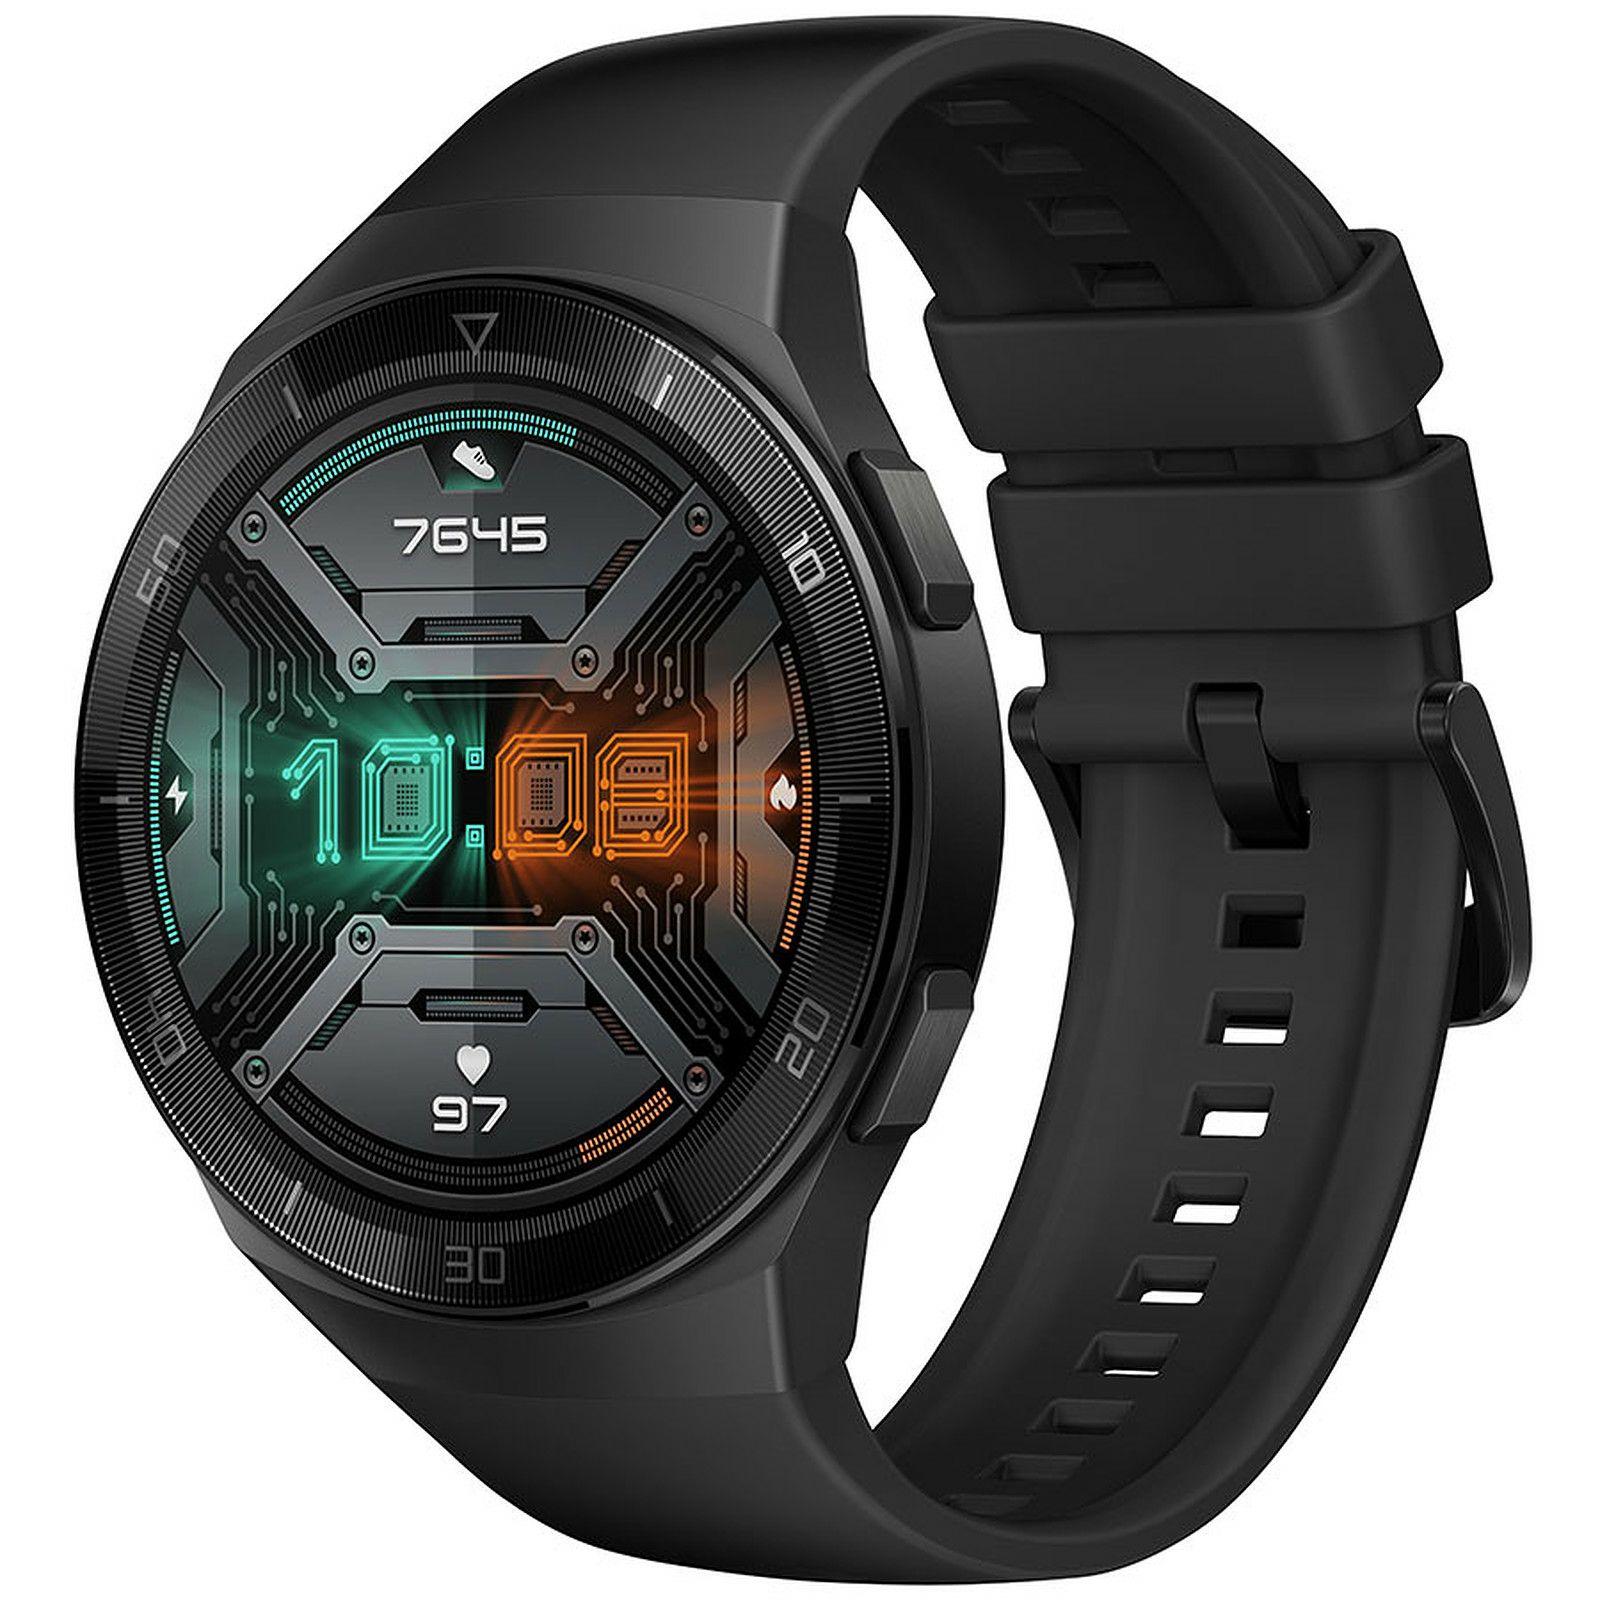 Huawei Watch GT2e: Smartwatch (SpO2-Monitoring, Herzfrequenz-Messung, Musik Wiedergabe, GPS, Fitness Tracker, 5ATM wasserdicht)